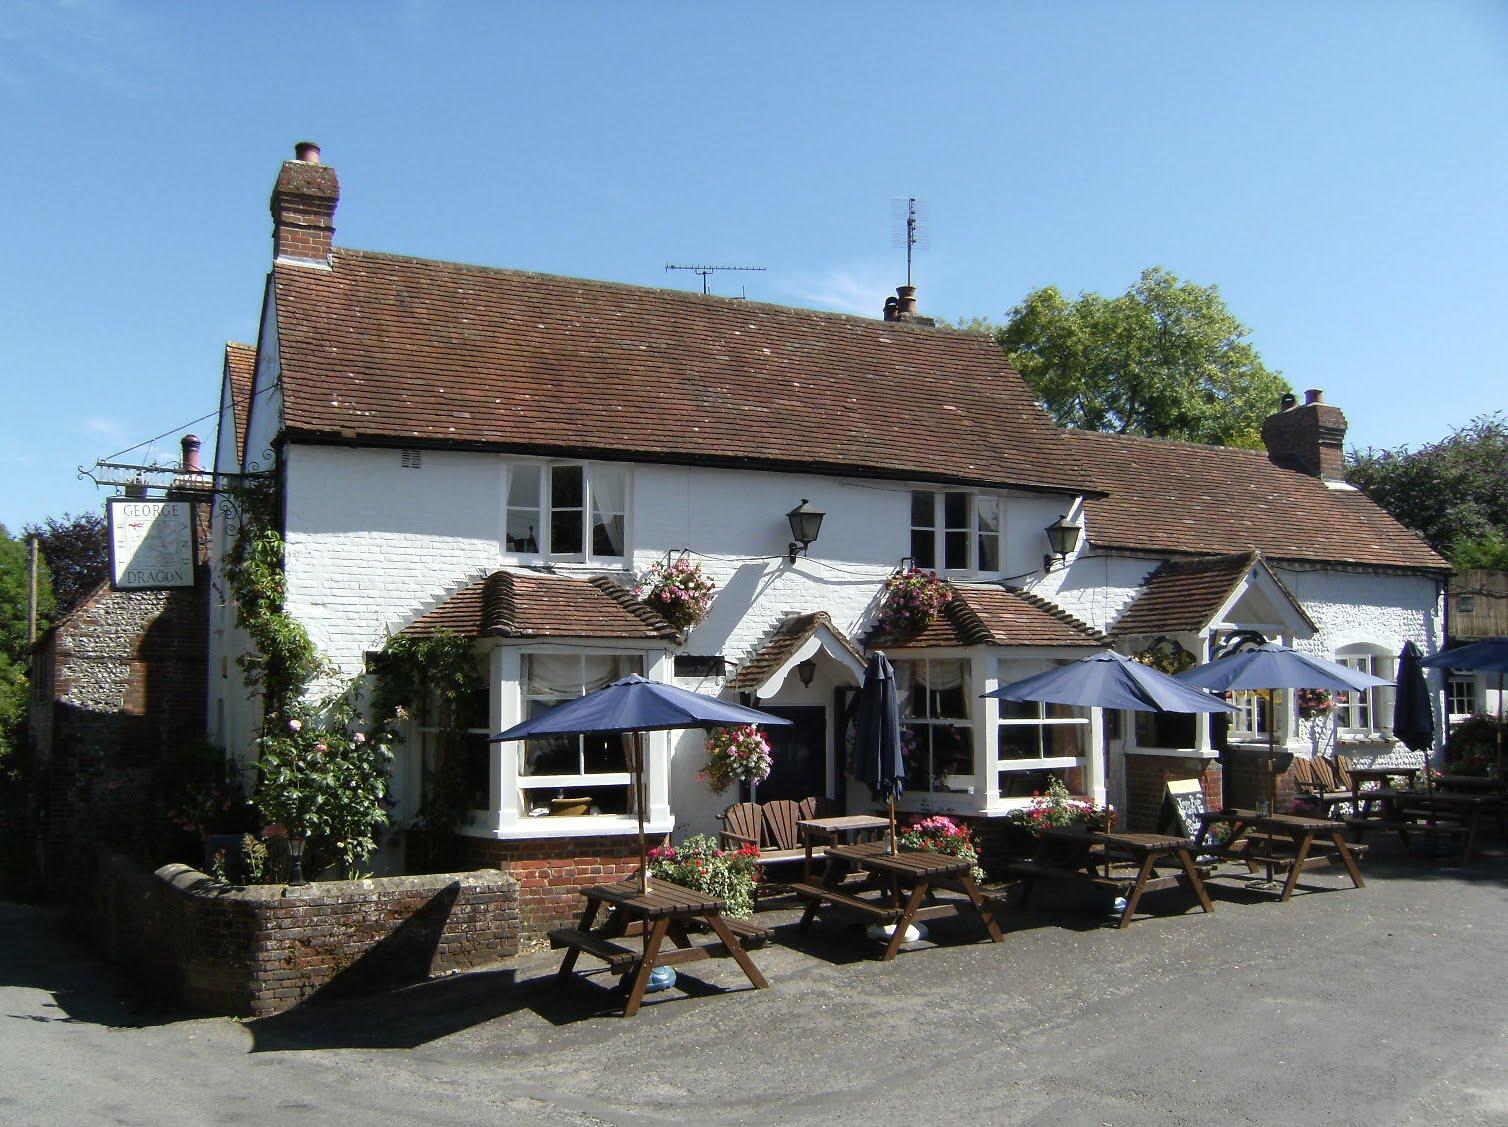 1007190134 George & Dragon Inn, Burpham